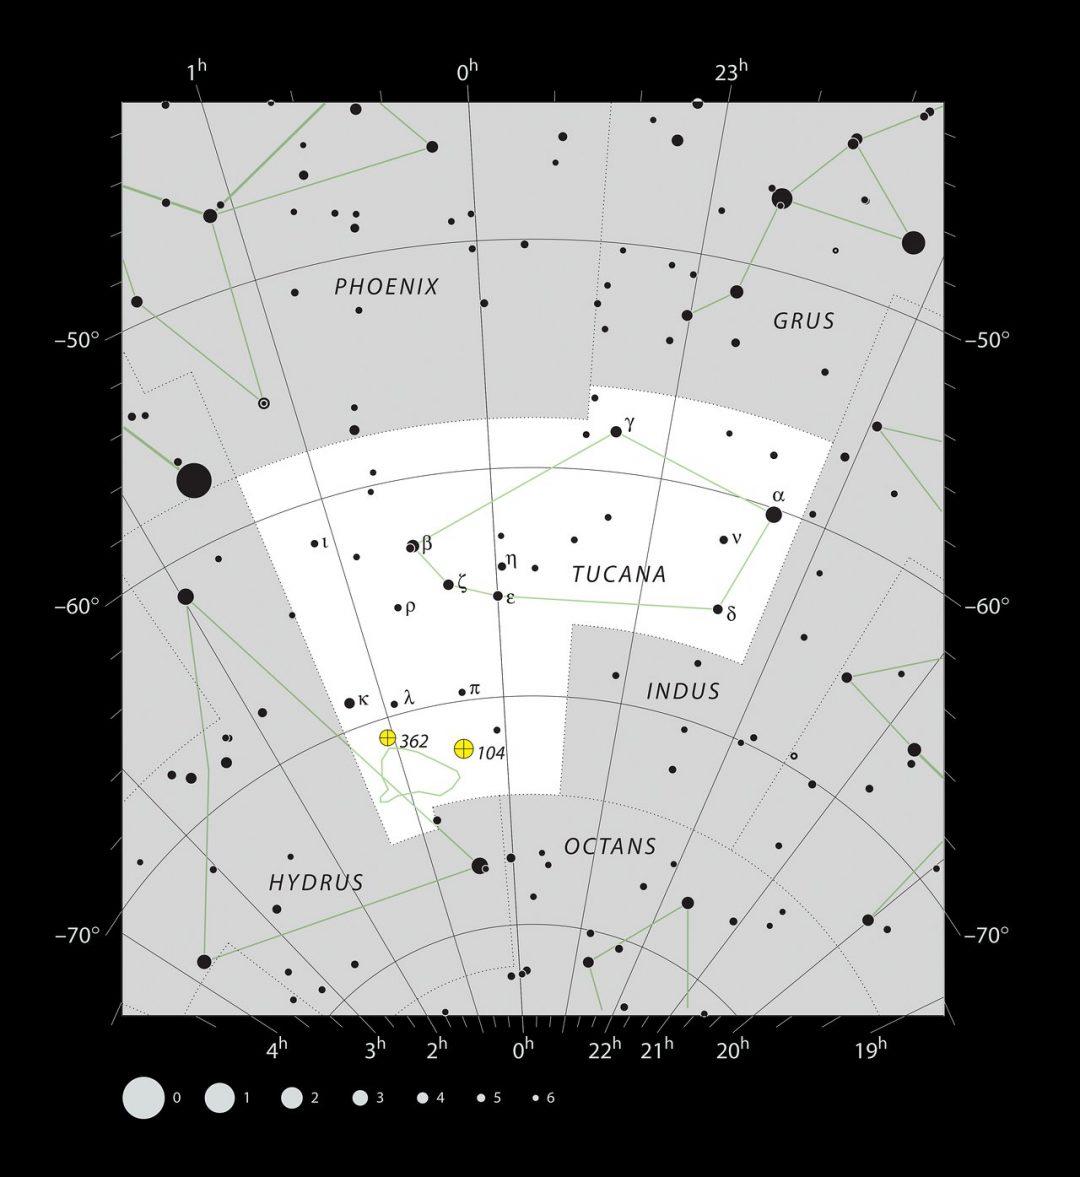 https://cdn.eso.org/images/large/eso1714c.jpg